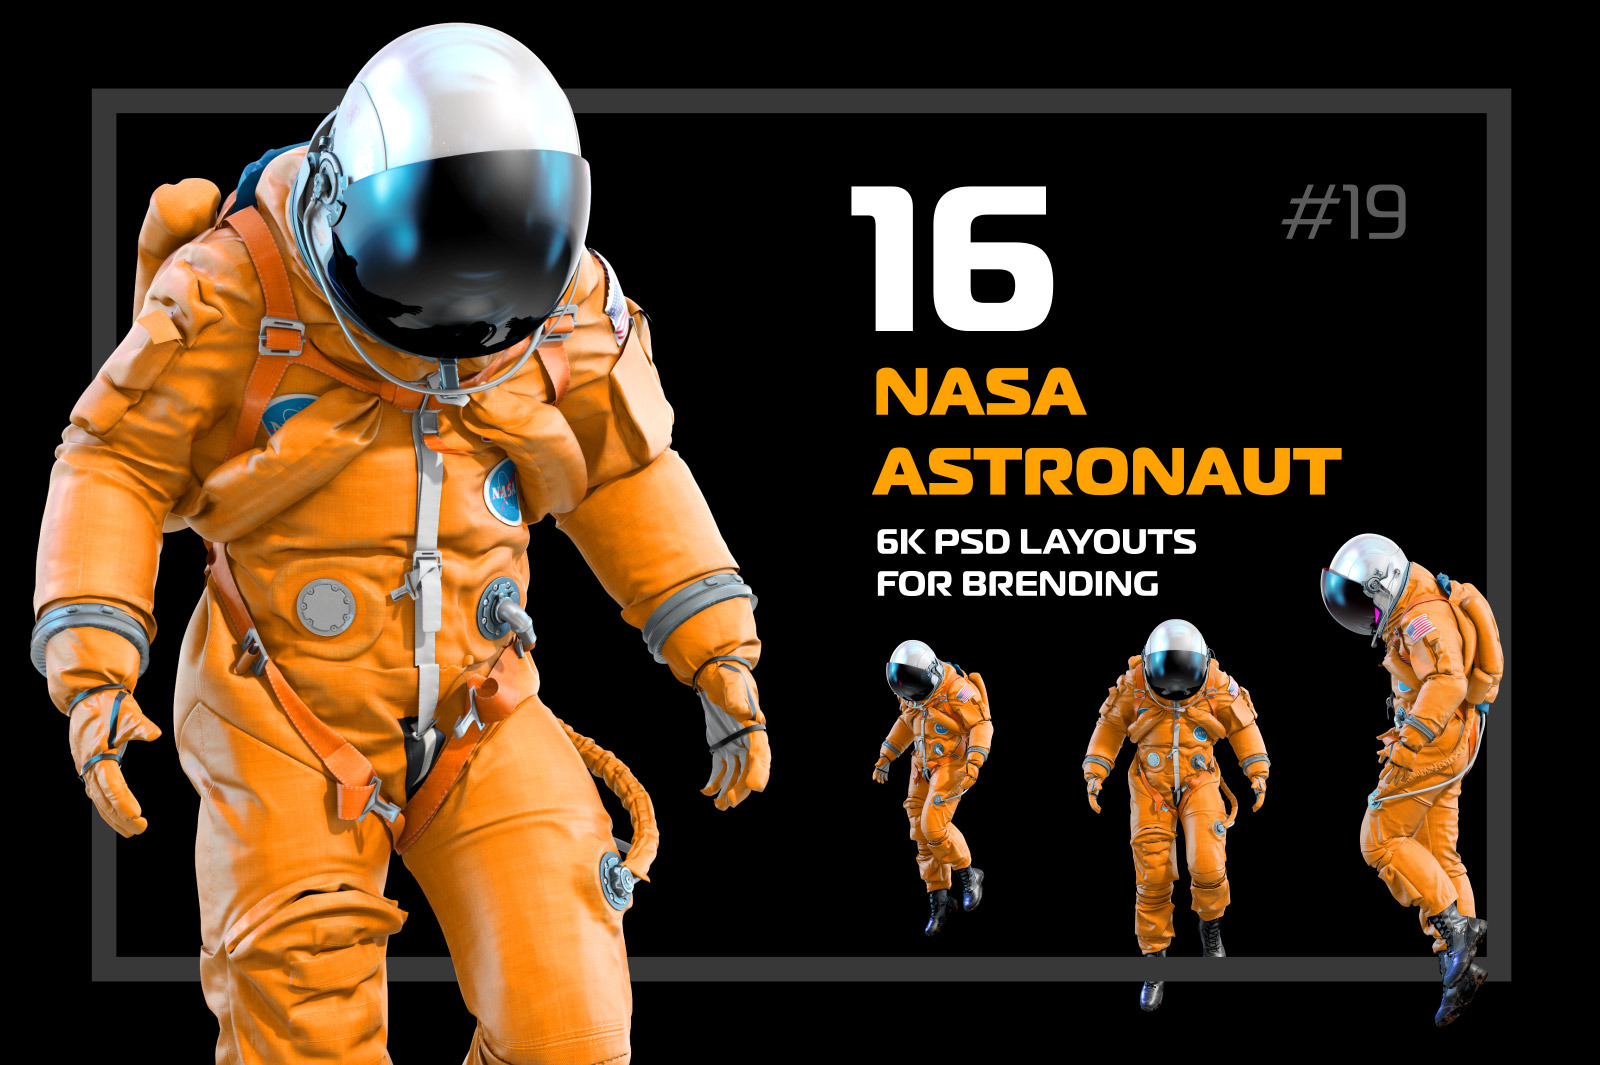 PSD Mockup 3D model NASA Astronaut #19